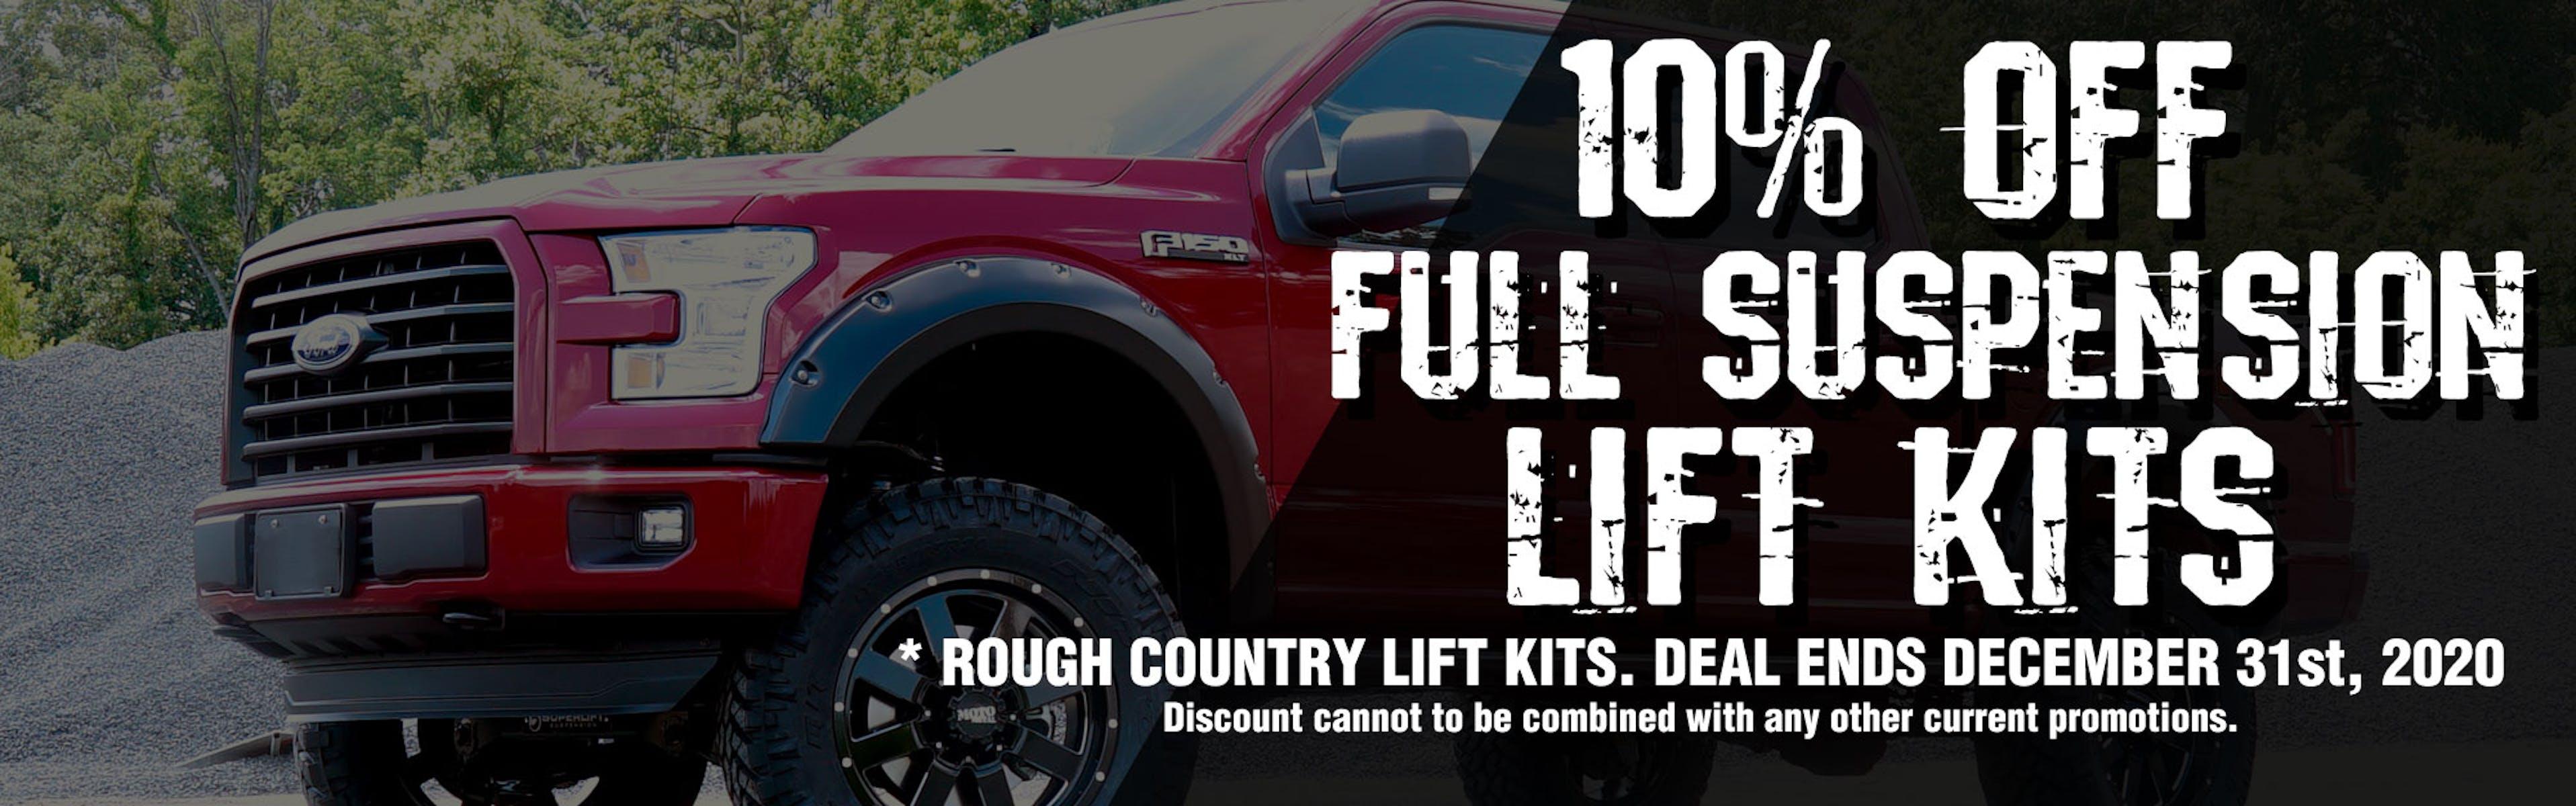 10% Off RC Lift Kits